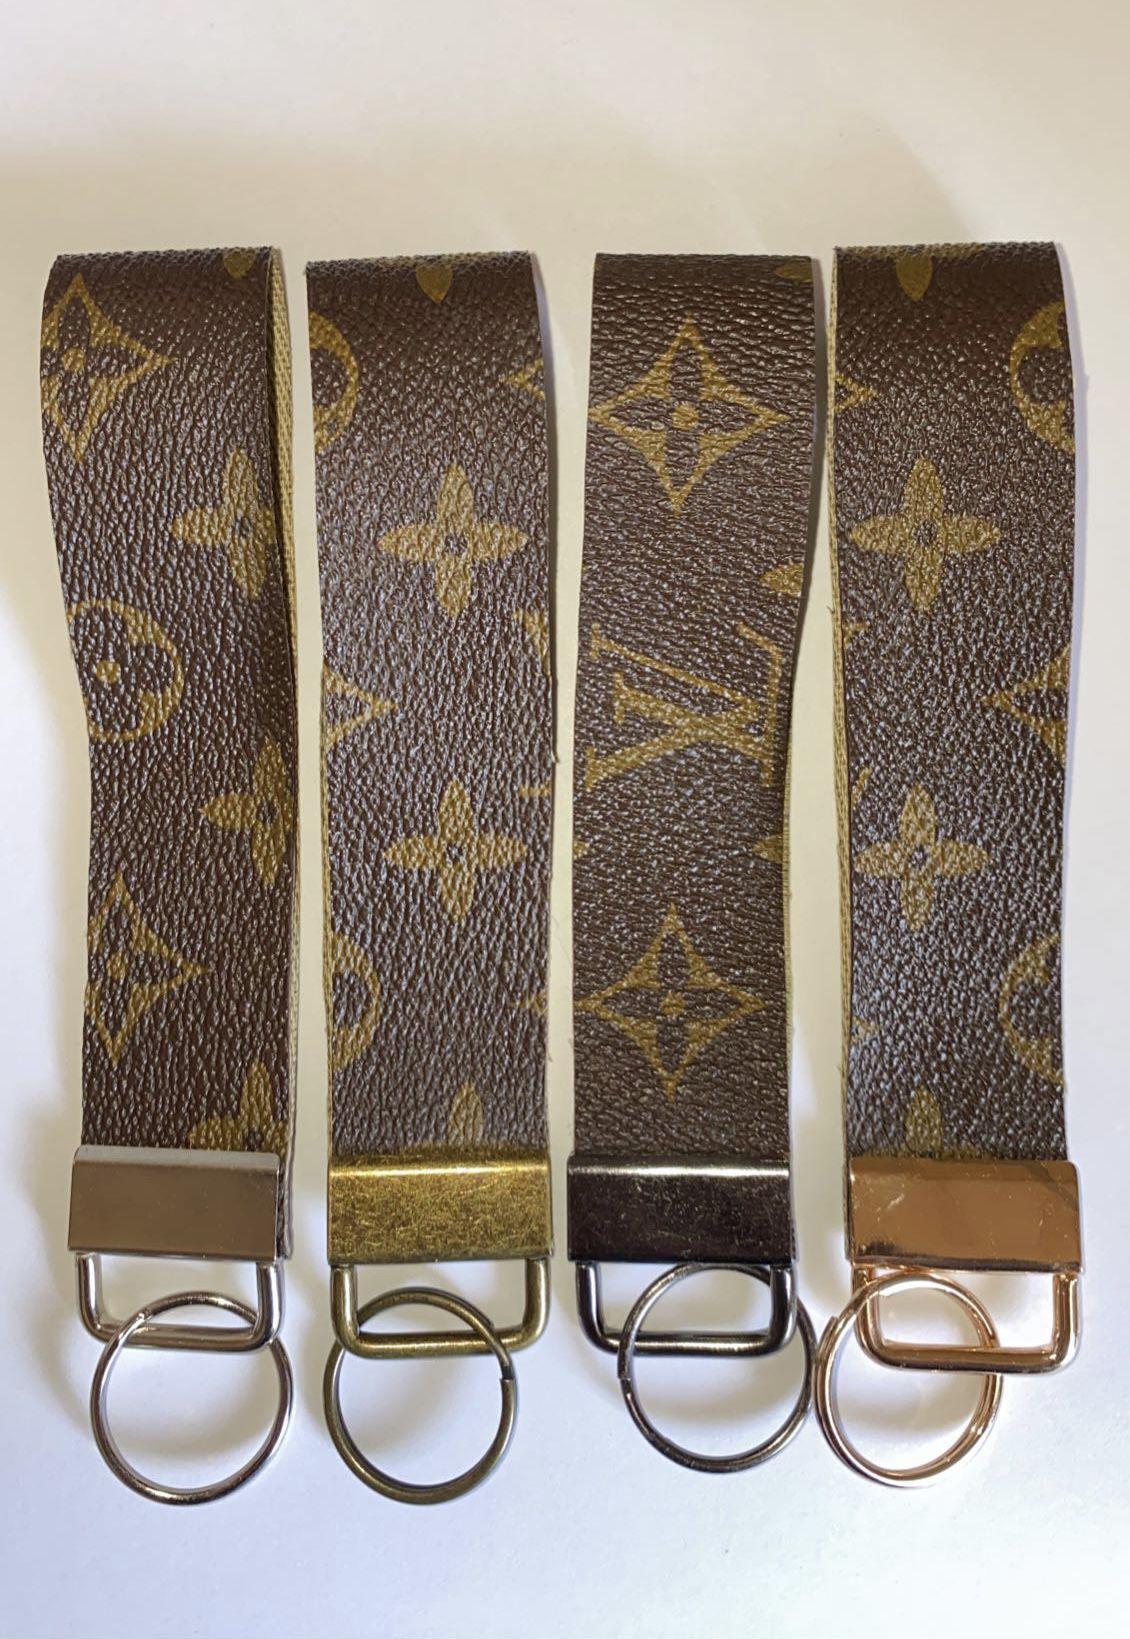 Louis Vuitton Key chains